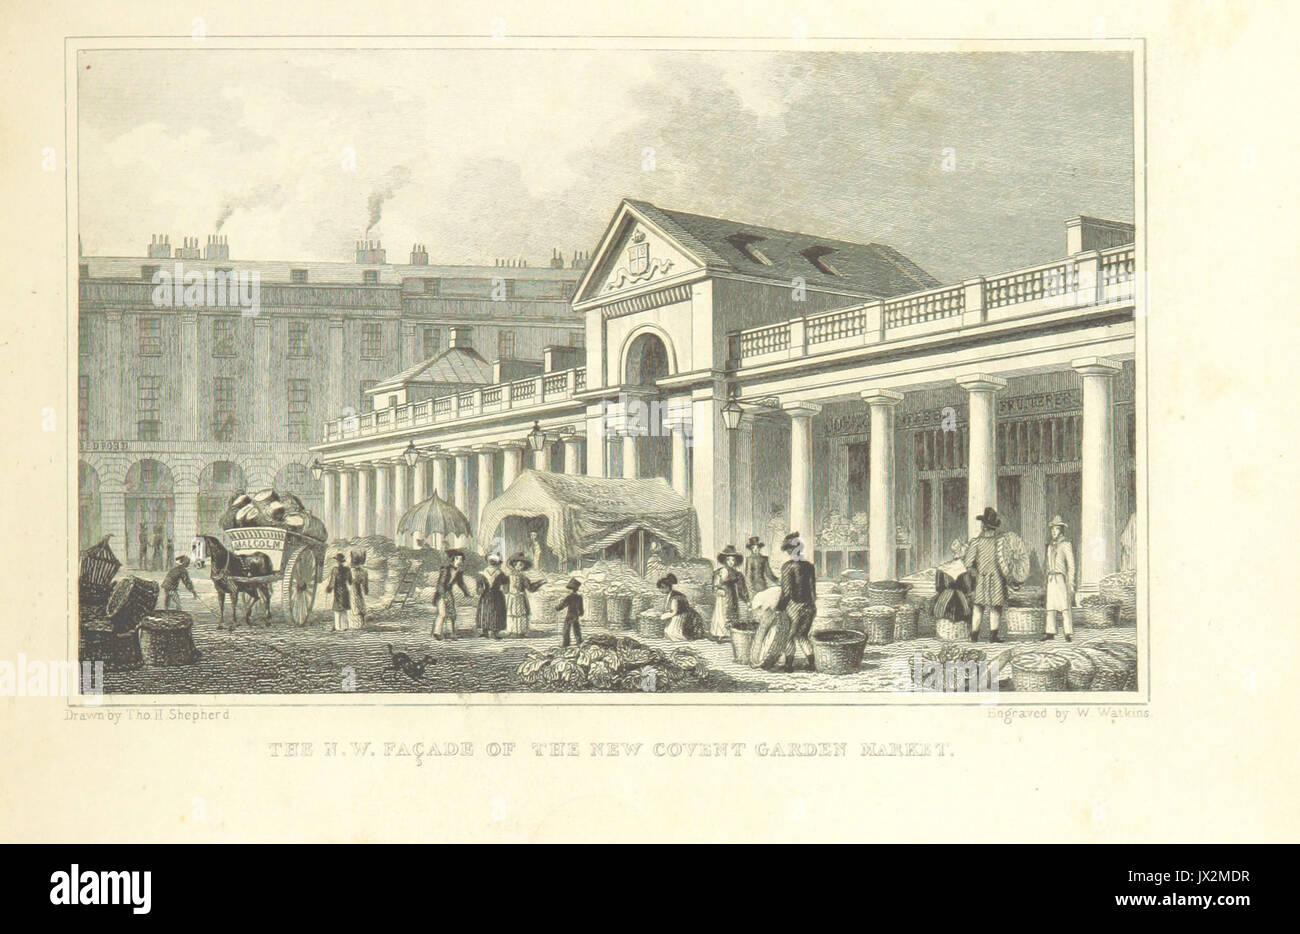 The NW Facade of the new Covent Garden Market   Shepherd, Metropolitan Improvements (1828), p203 - Stock Image